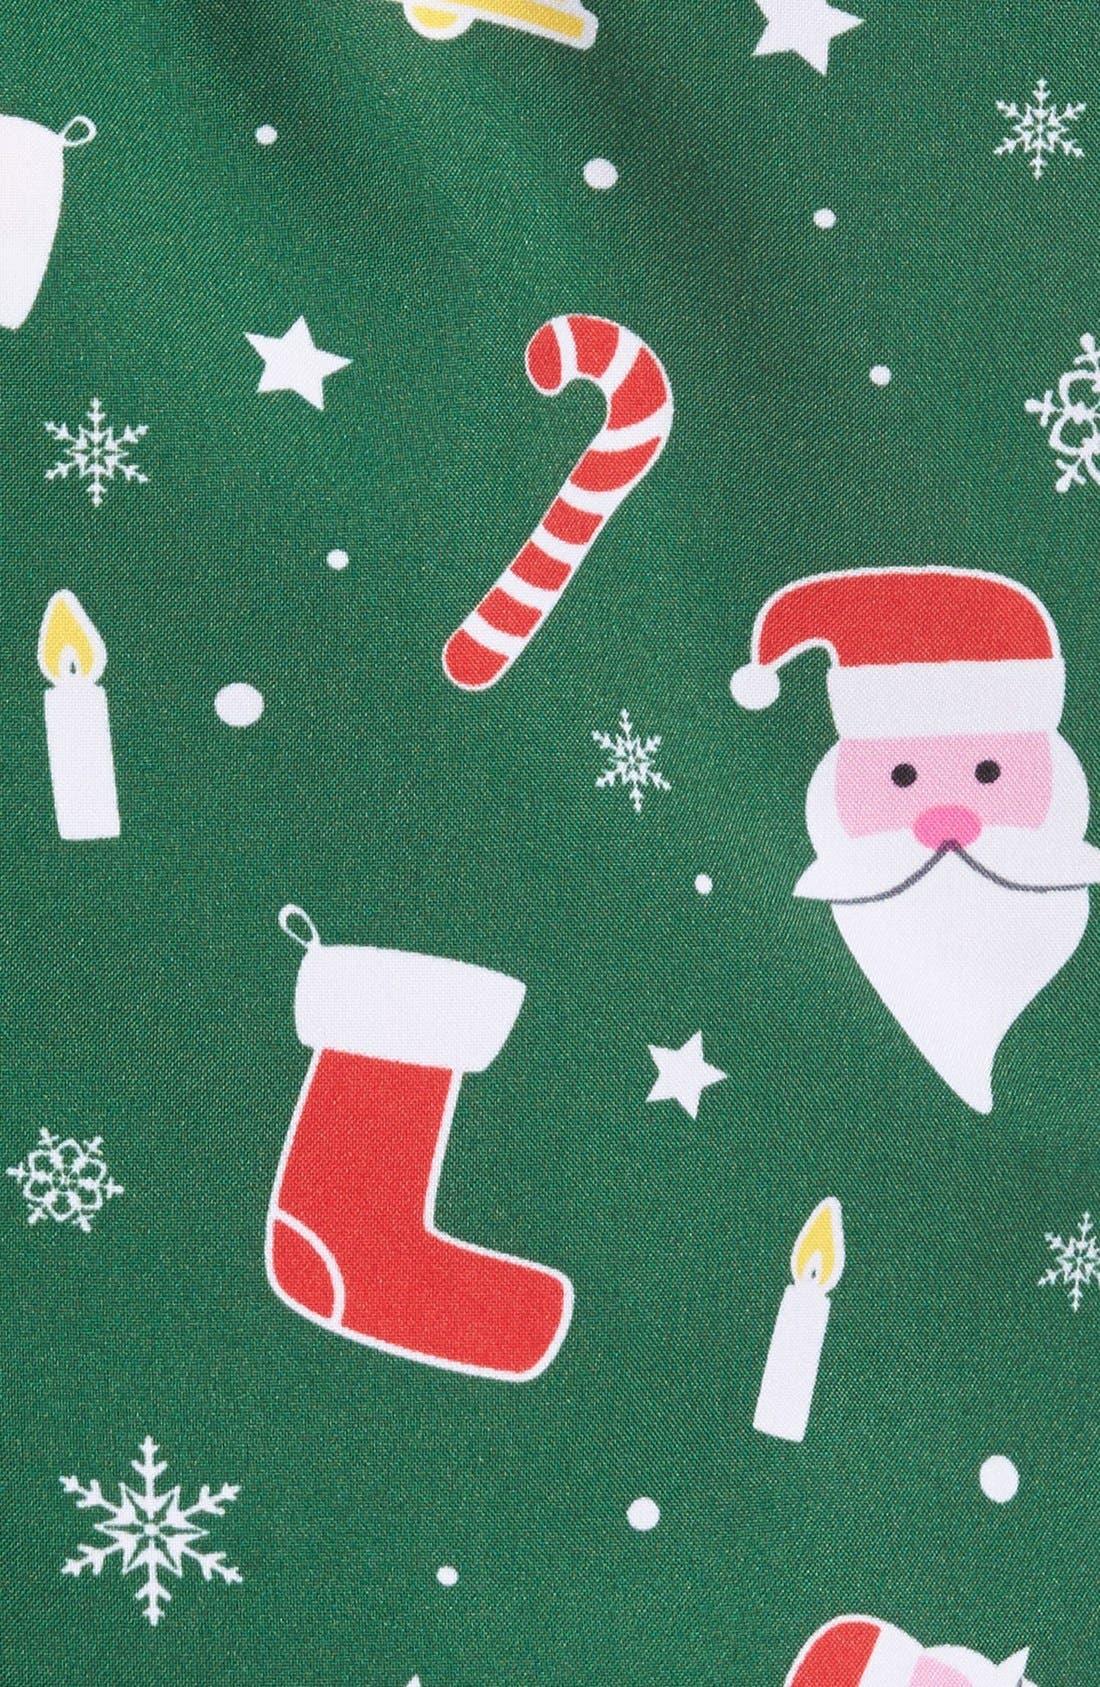 'Santaboss' Trim Fit Two-Piece Suit with Tie,                             Alternate thumbnail 3, color,                             301